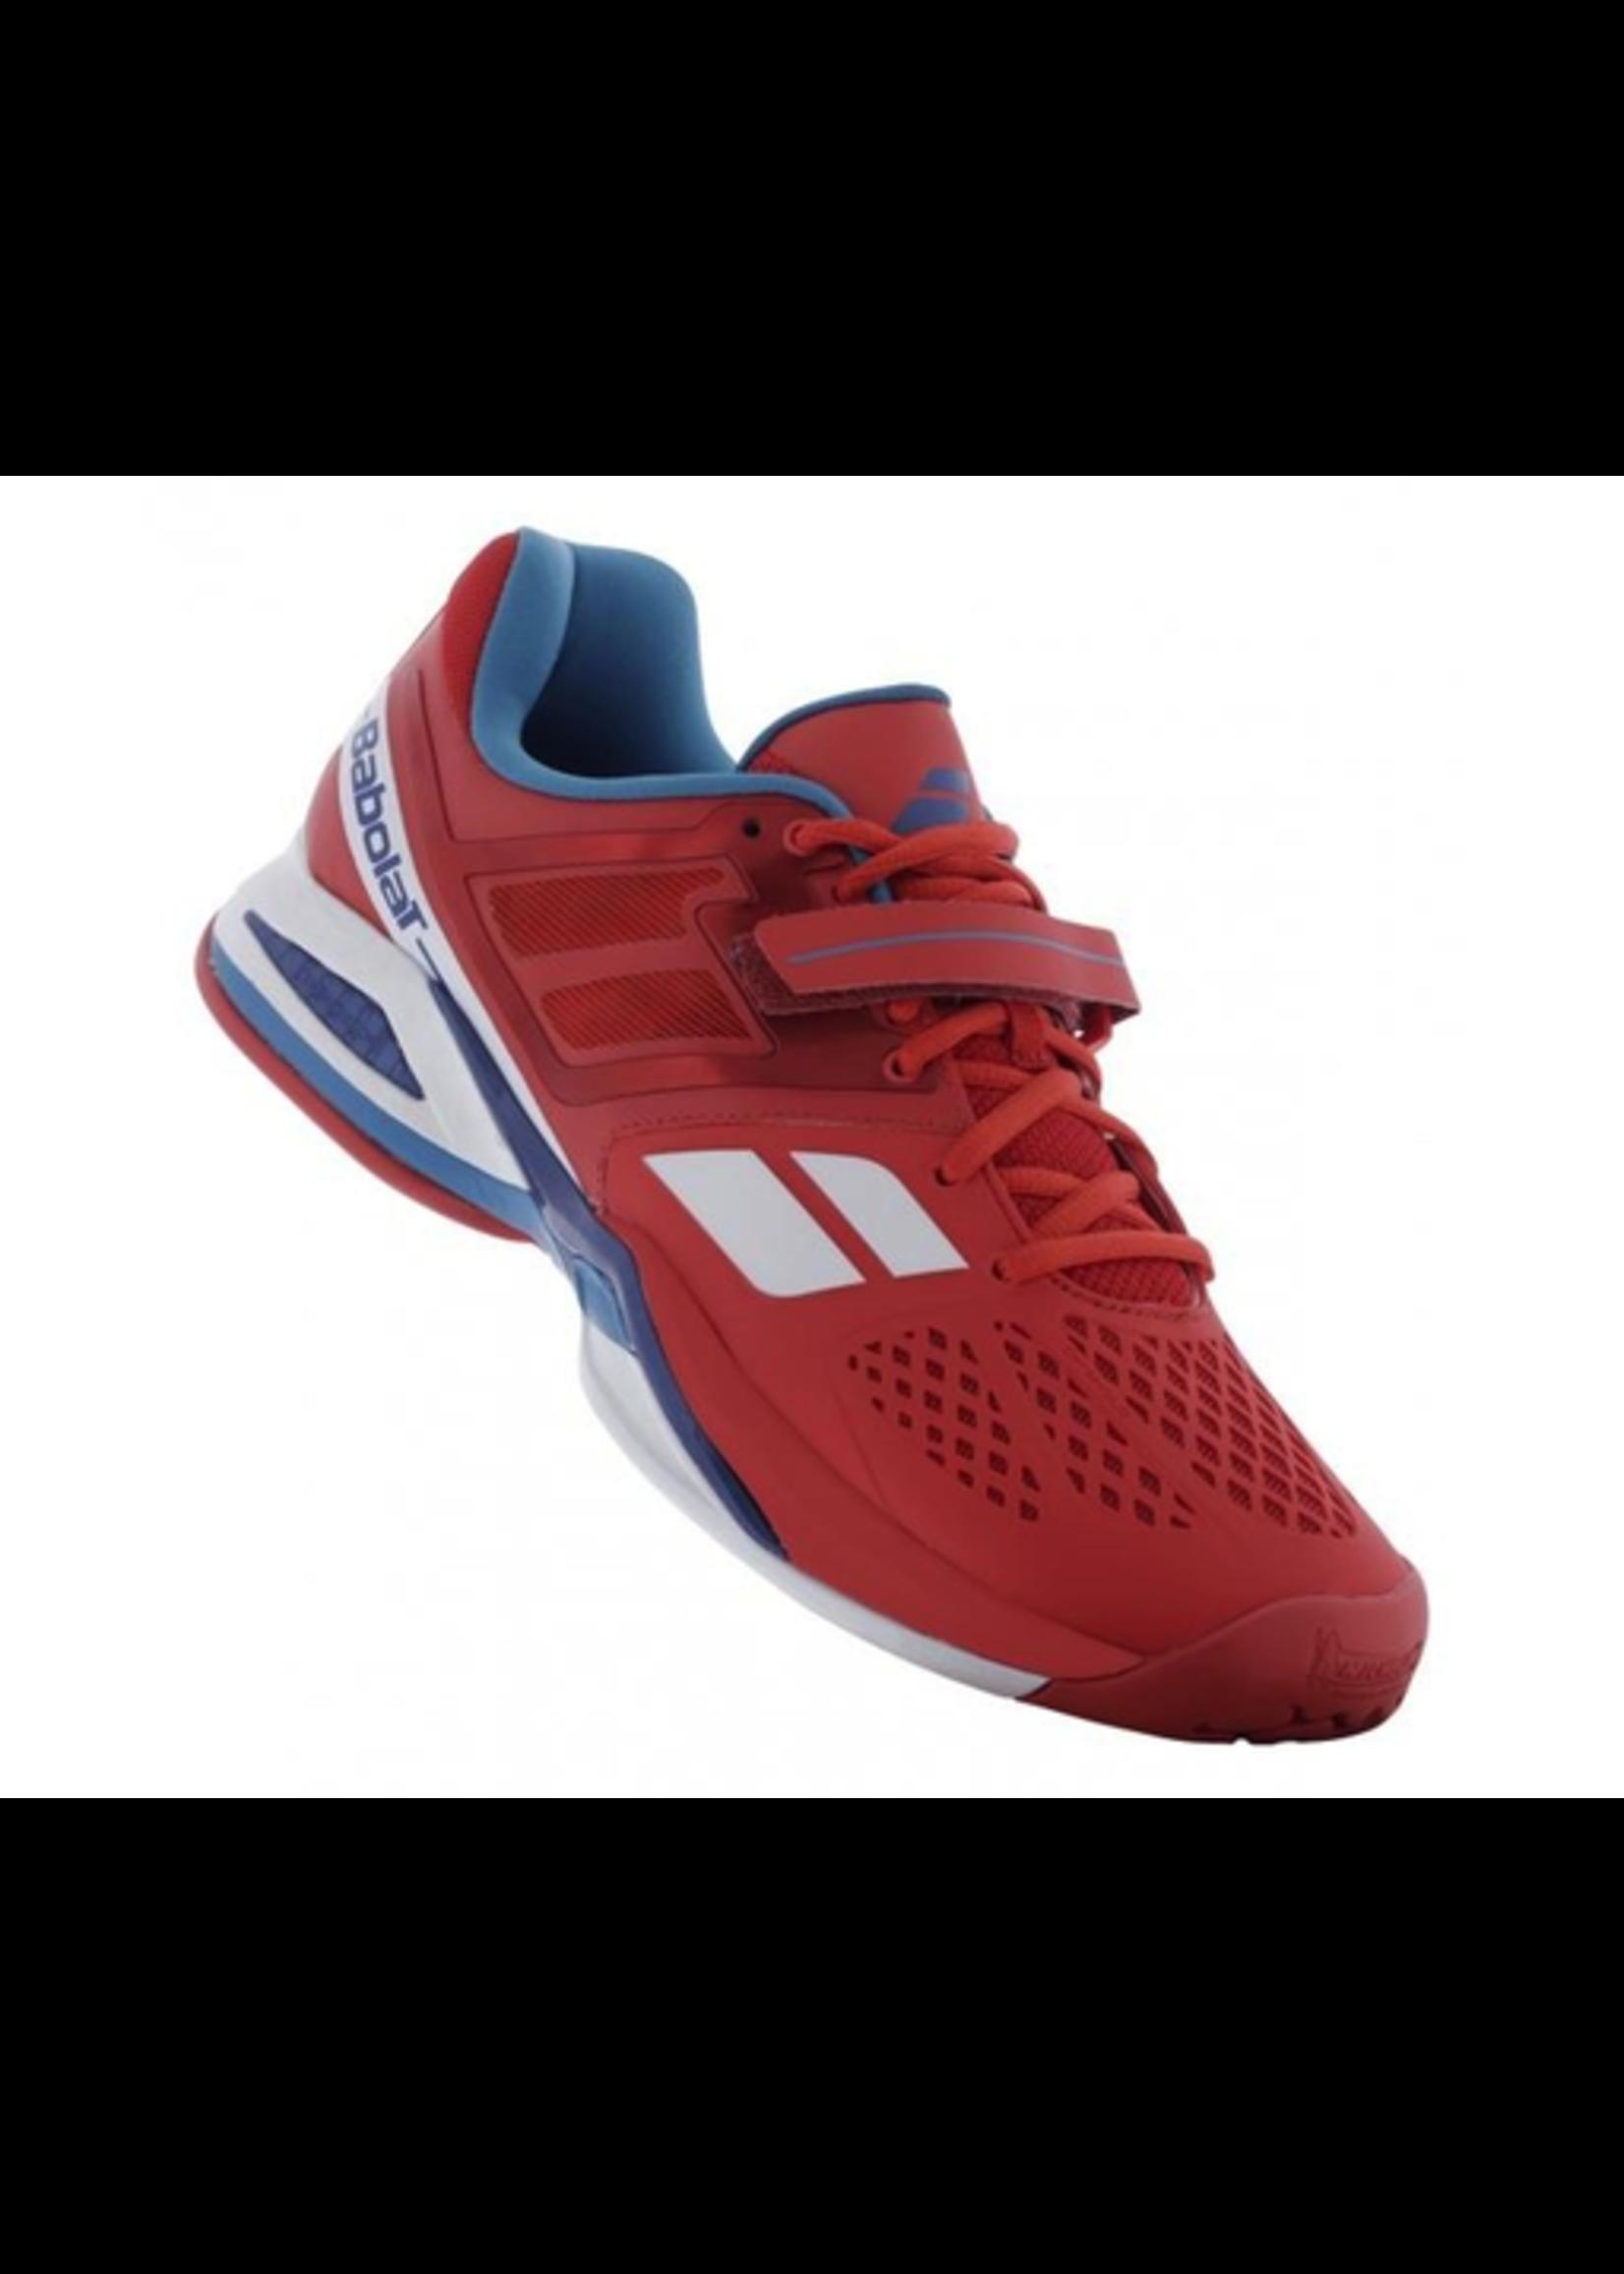 Babolat Babolat Propulse BPM Mens A/C Tennis Shoe Red UK 8